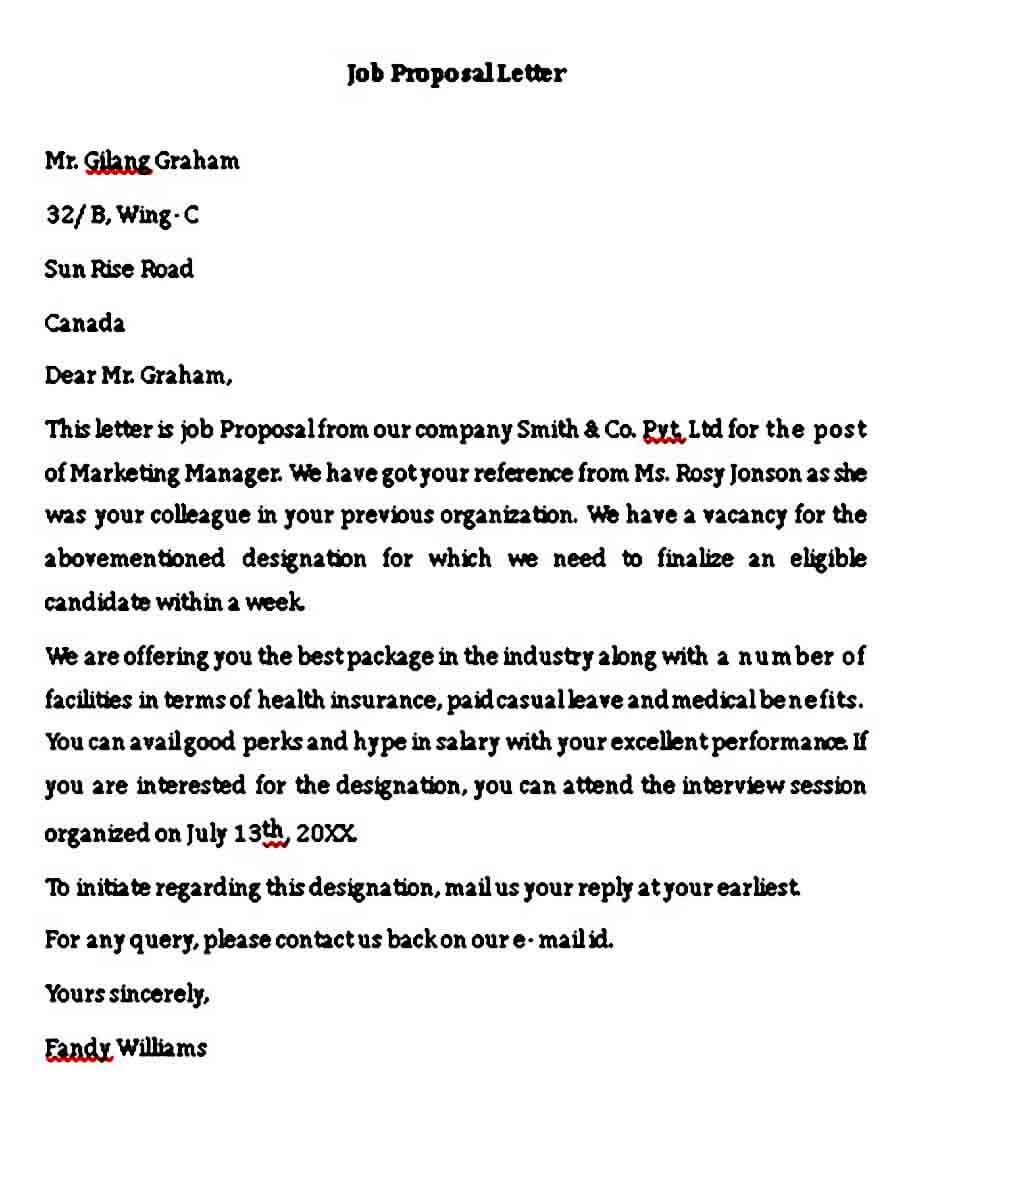 Job Proposal Letter templates